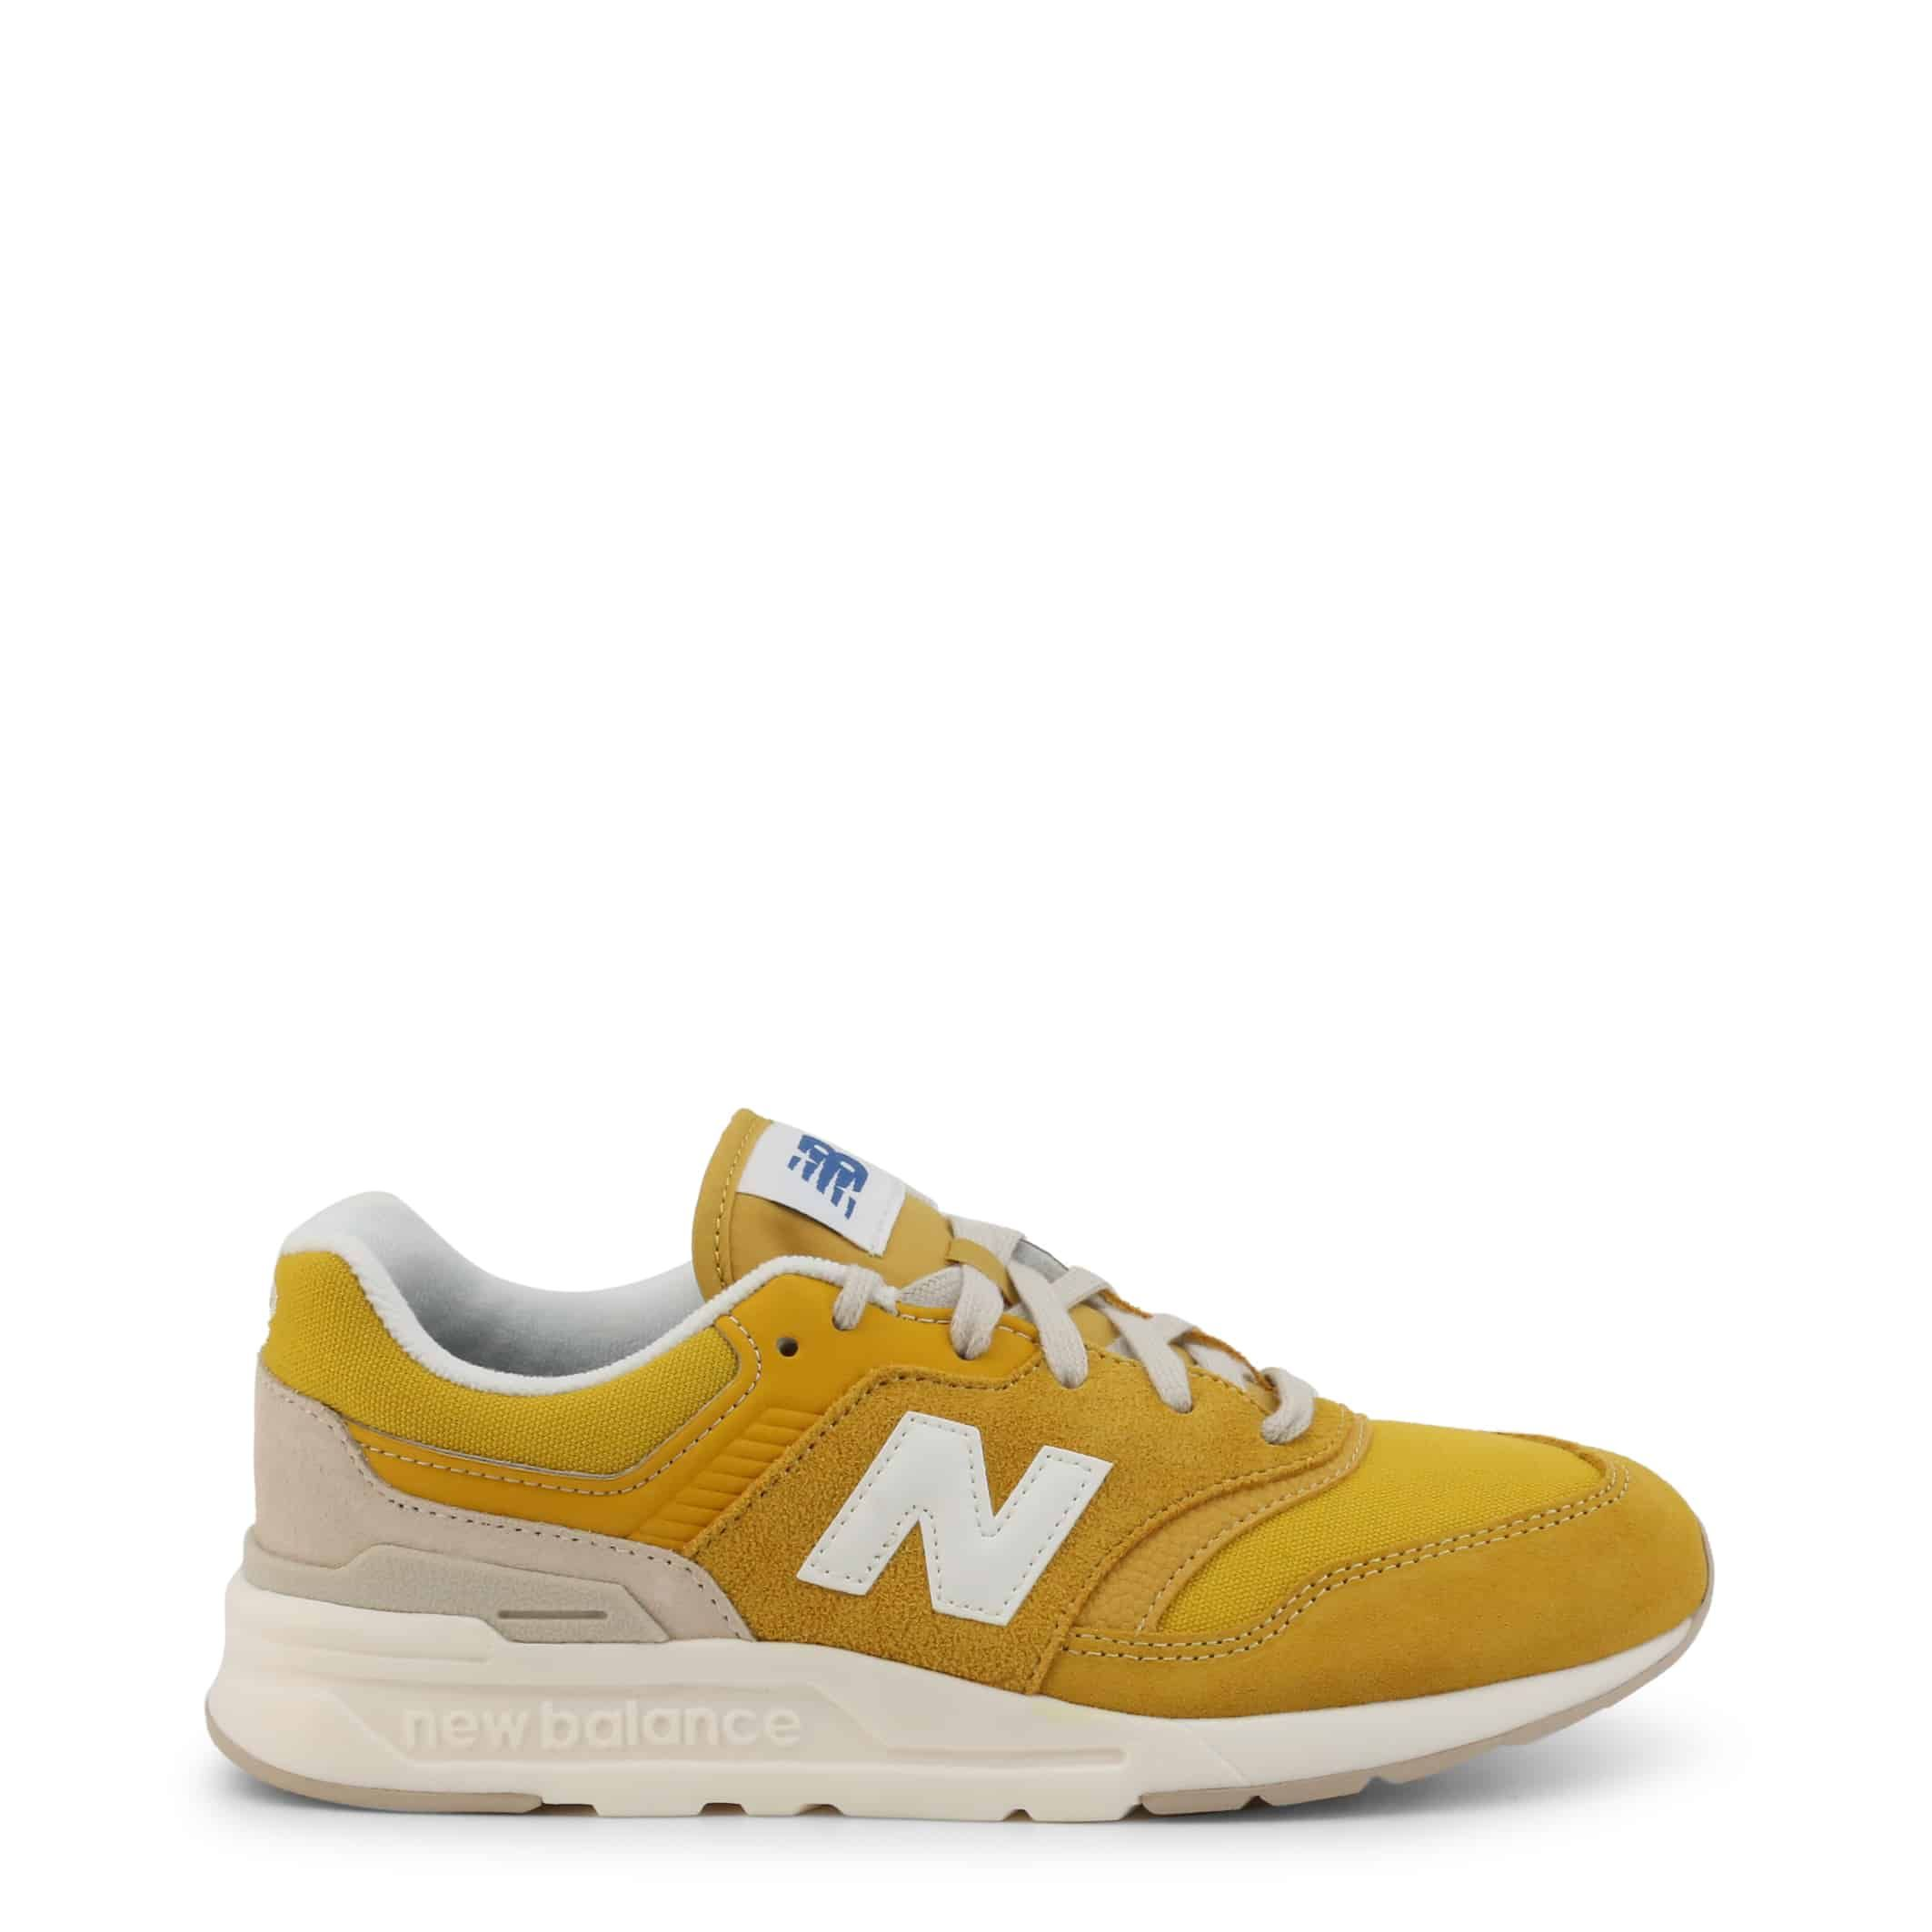 New Balance – GR997 – Geel Designeritems.nl